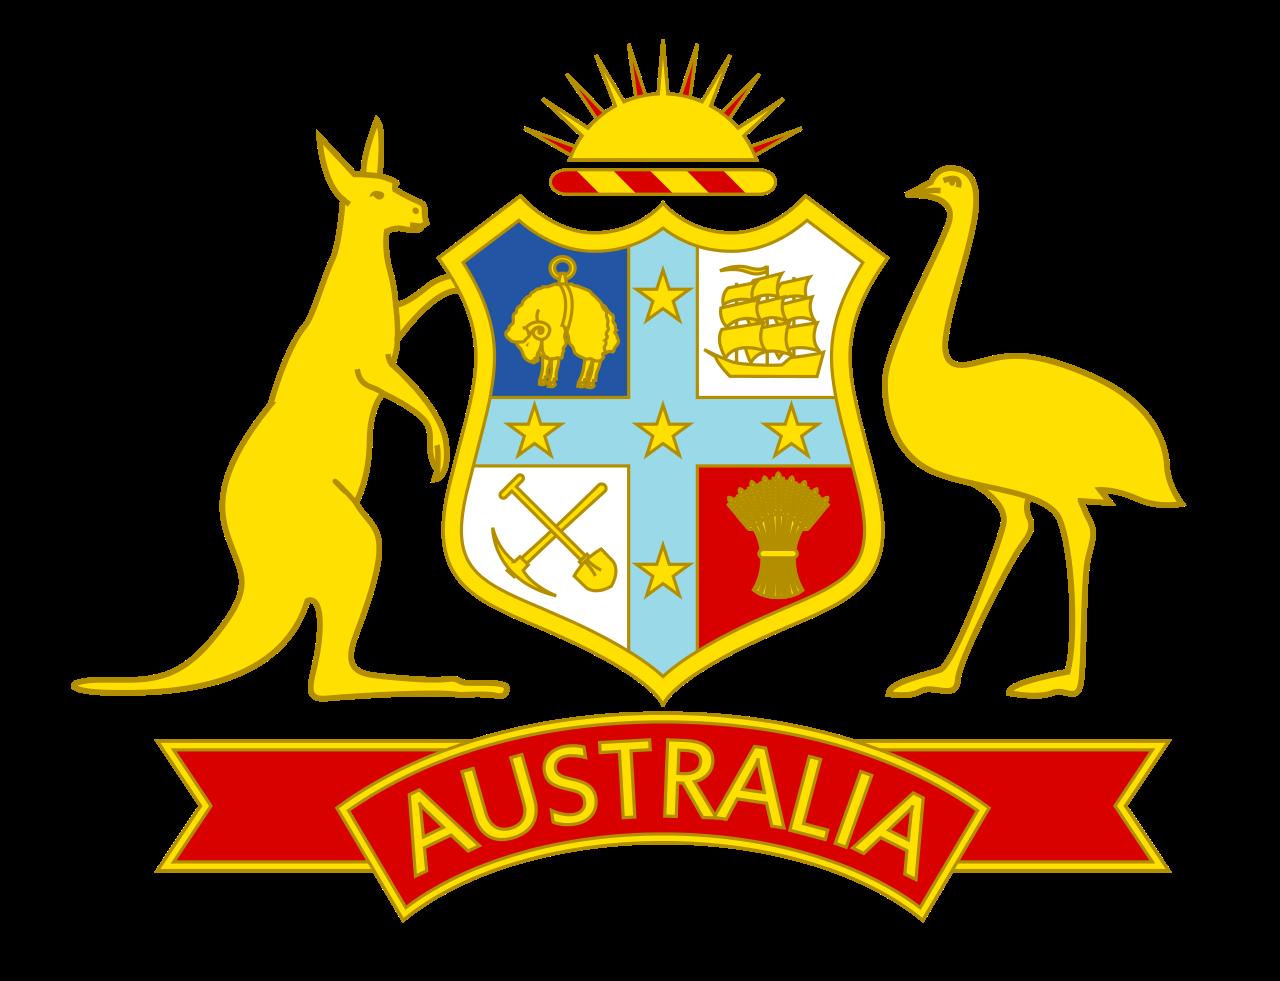 Australia National Cricket Team Rugby Union Teams National Football Teams Australia Cricket Team